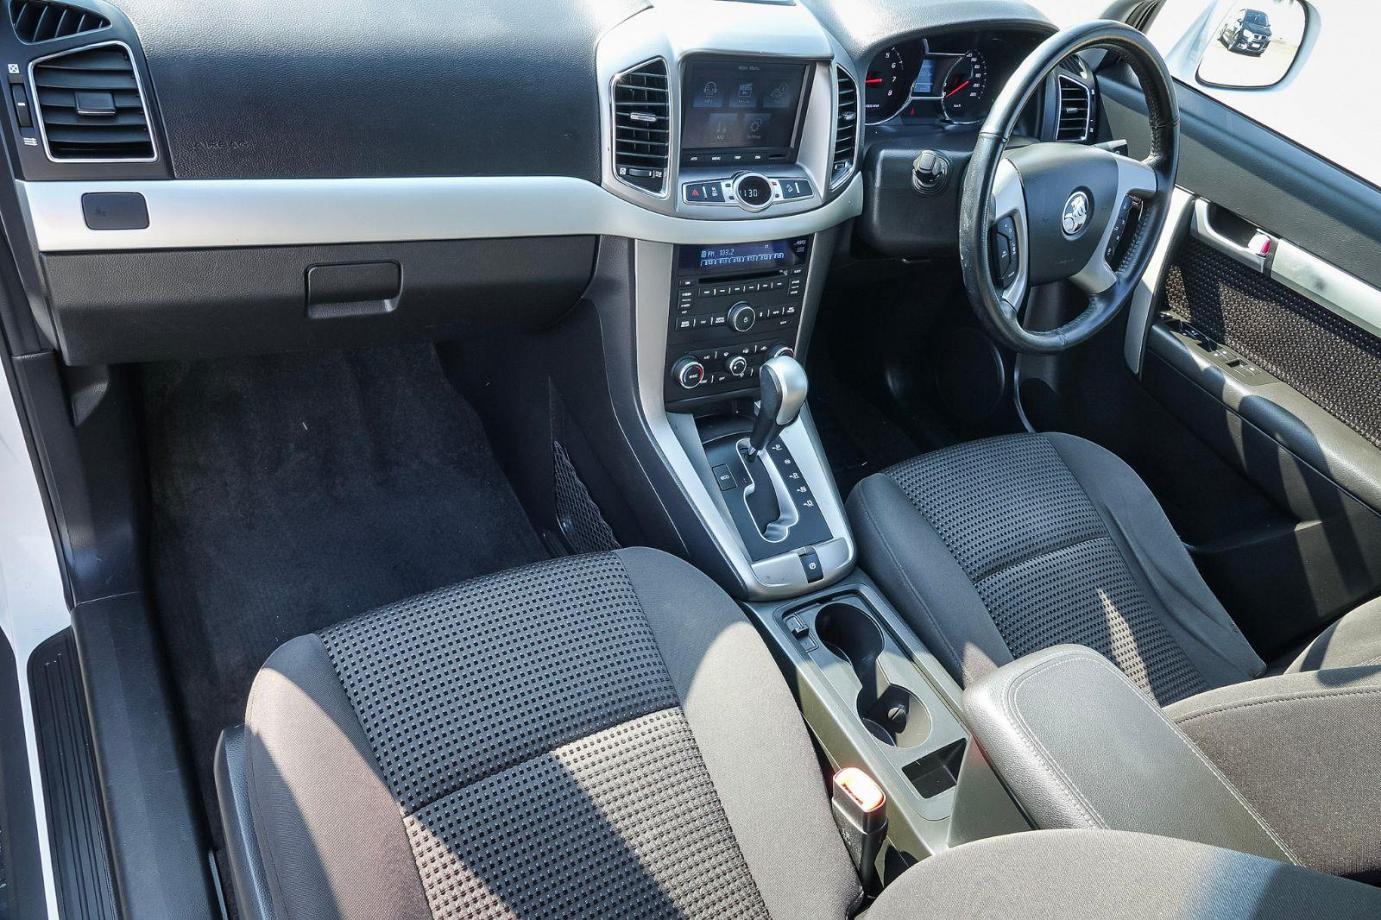 2015 Holden Captiva CG MY15 7 LS Wagon 7st 5dr Spts Auto 6sp 2.4i FWD